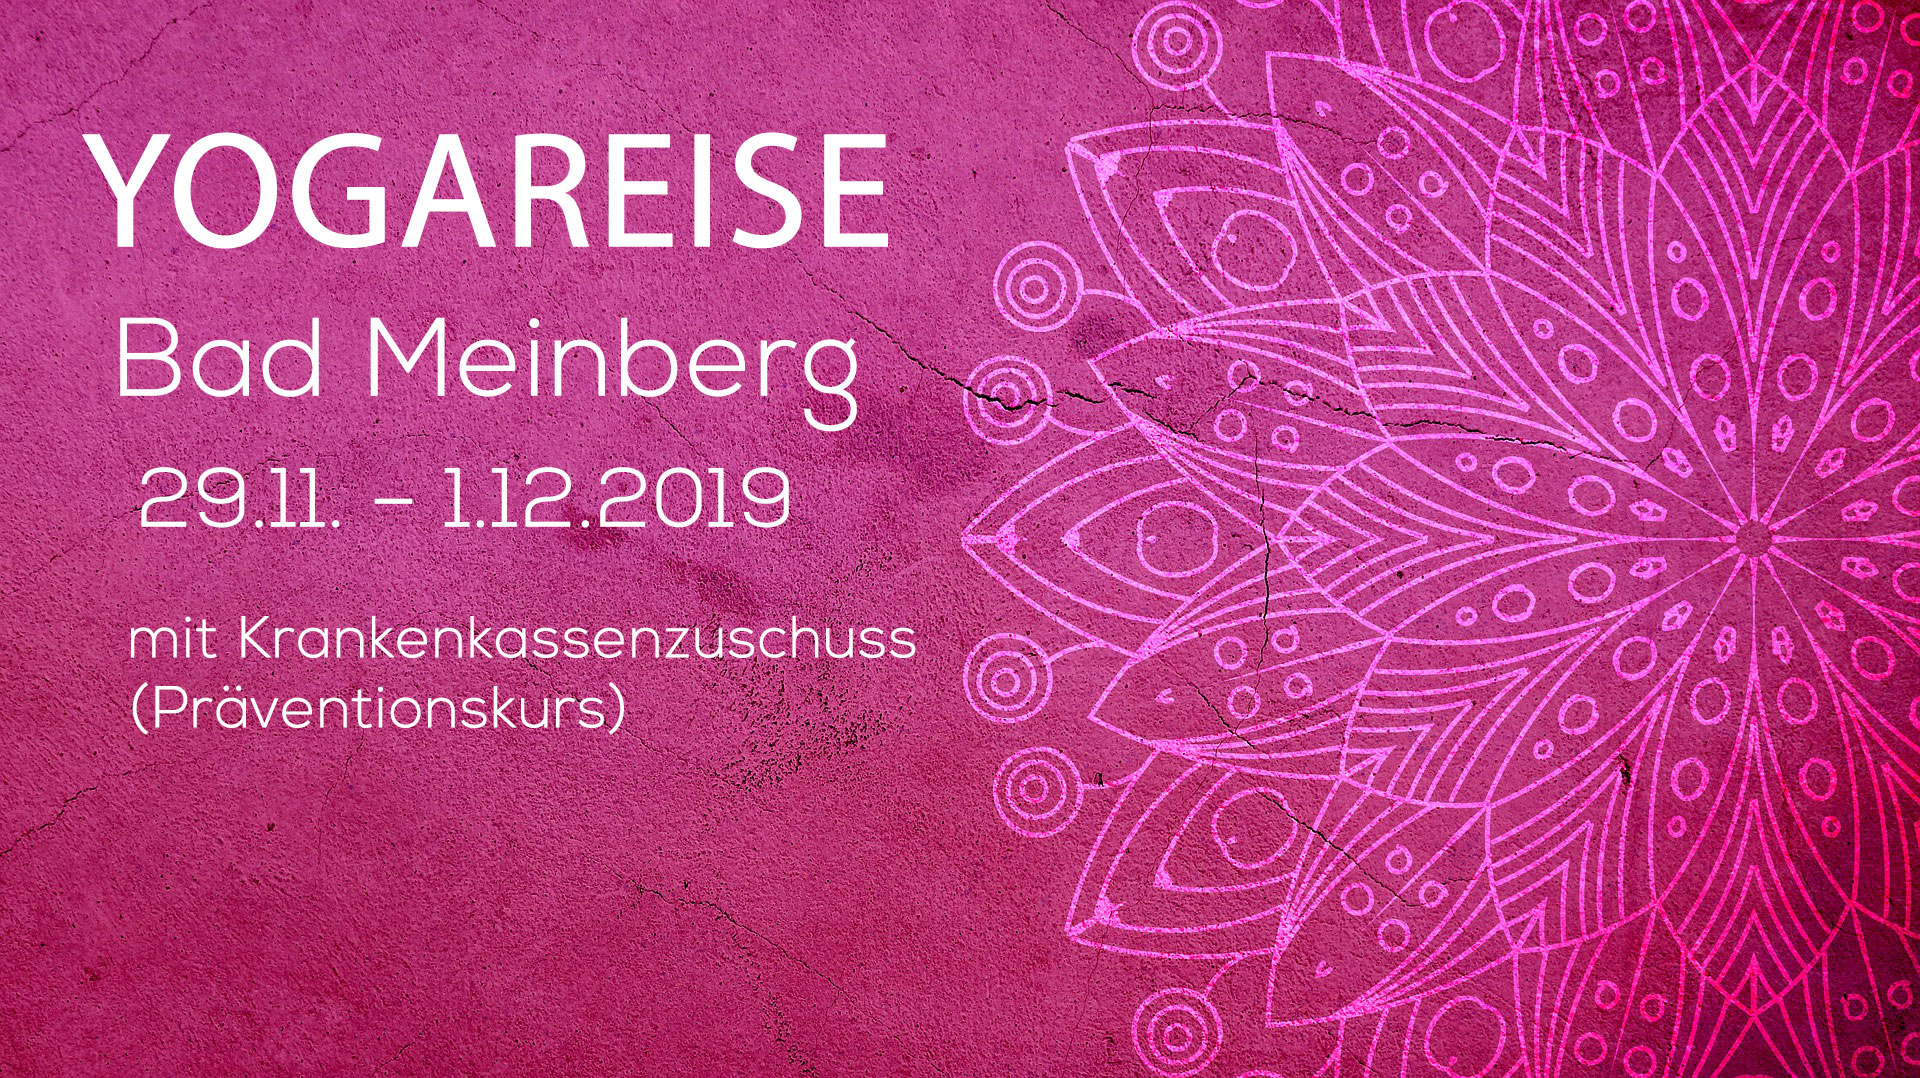 Yogareise nach Bad Meinberg